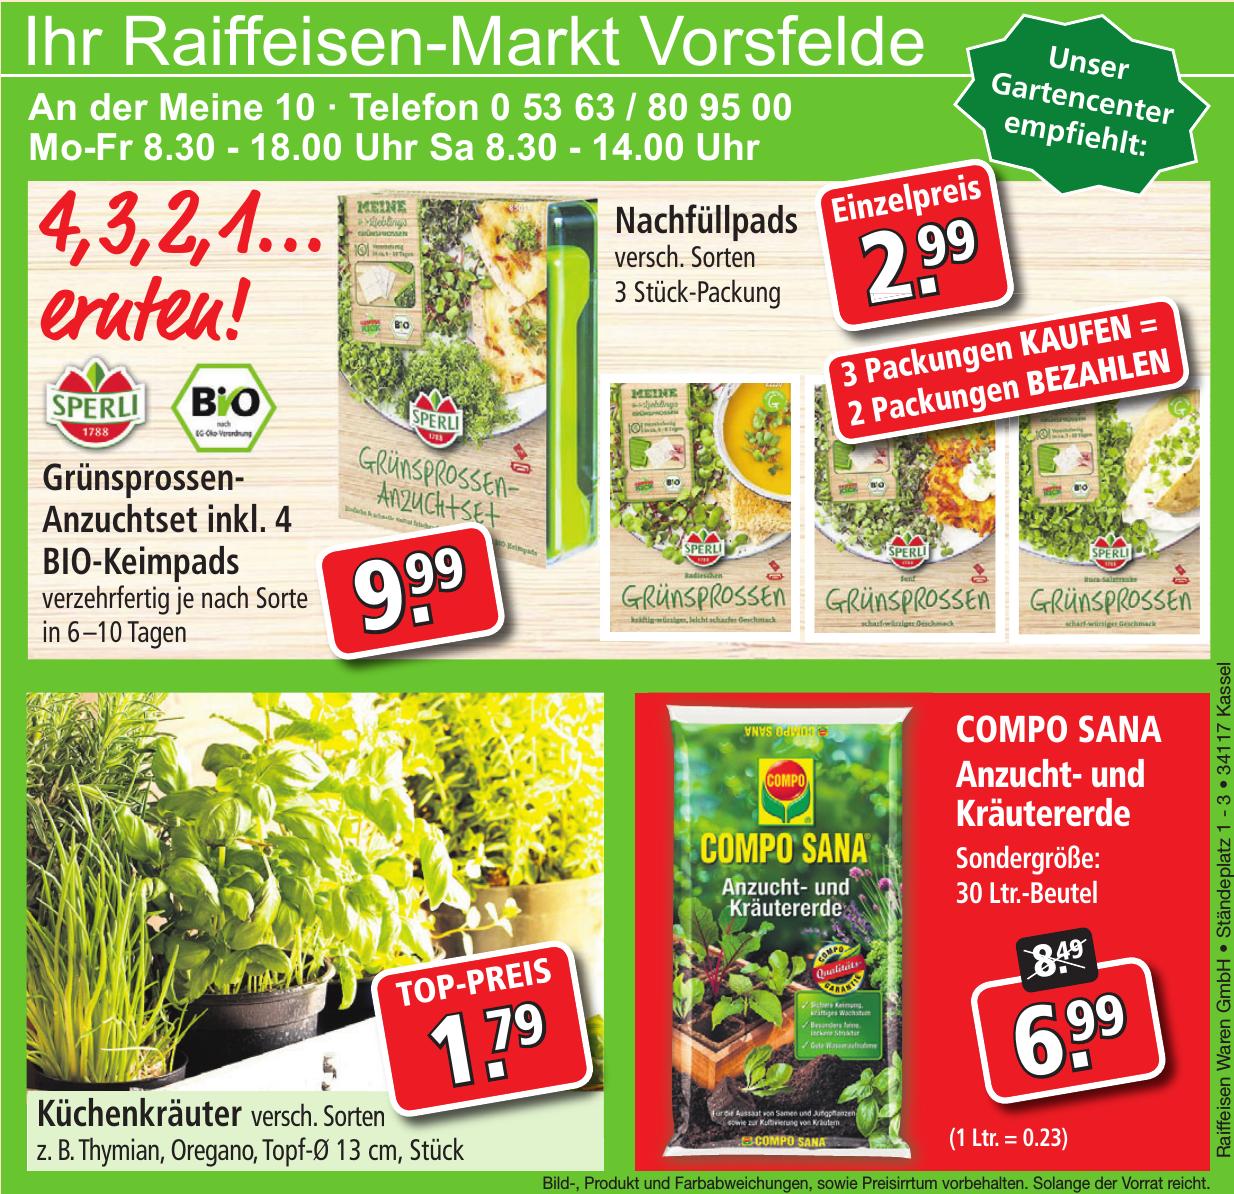 Raiffeisen-Markt Vorsfelde